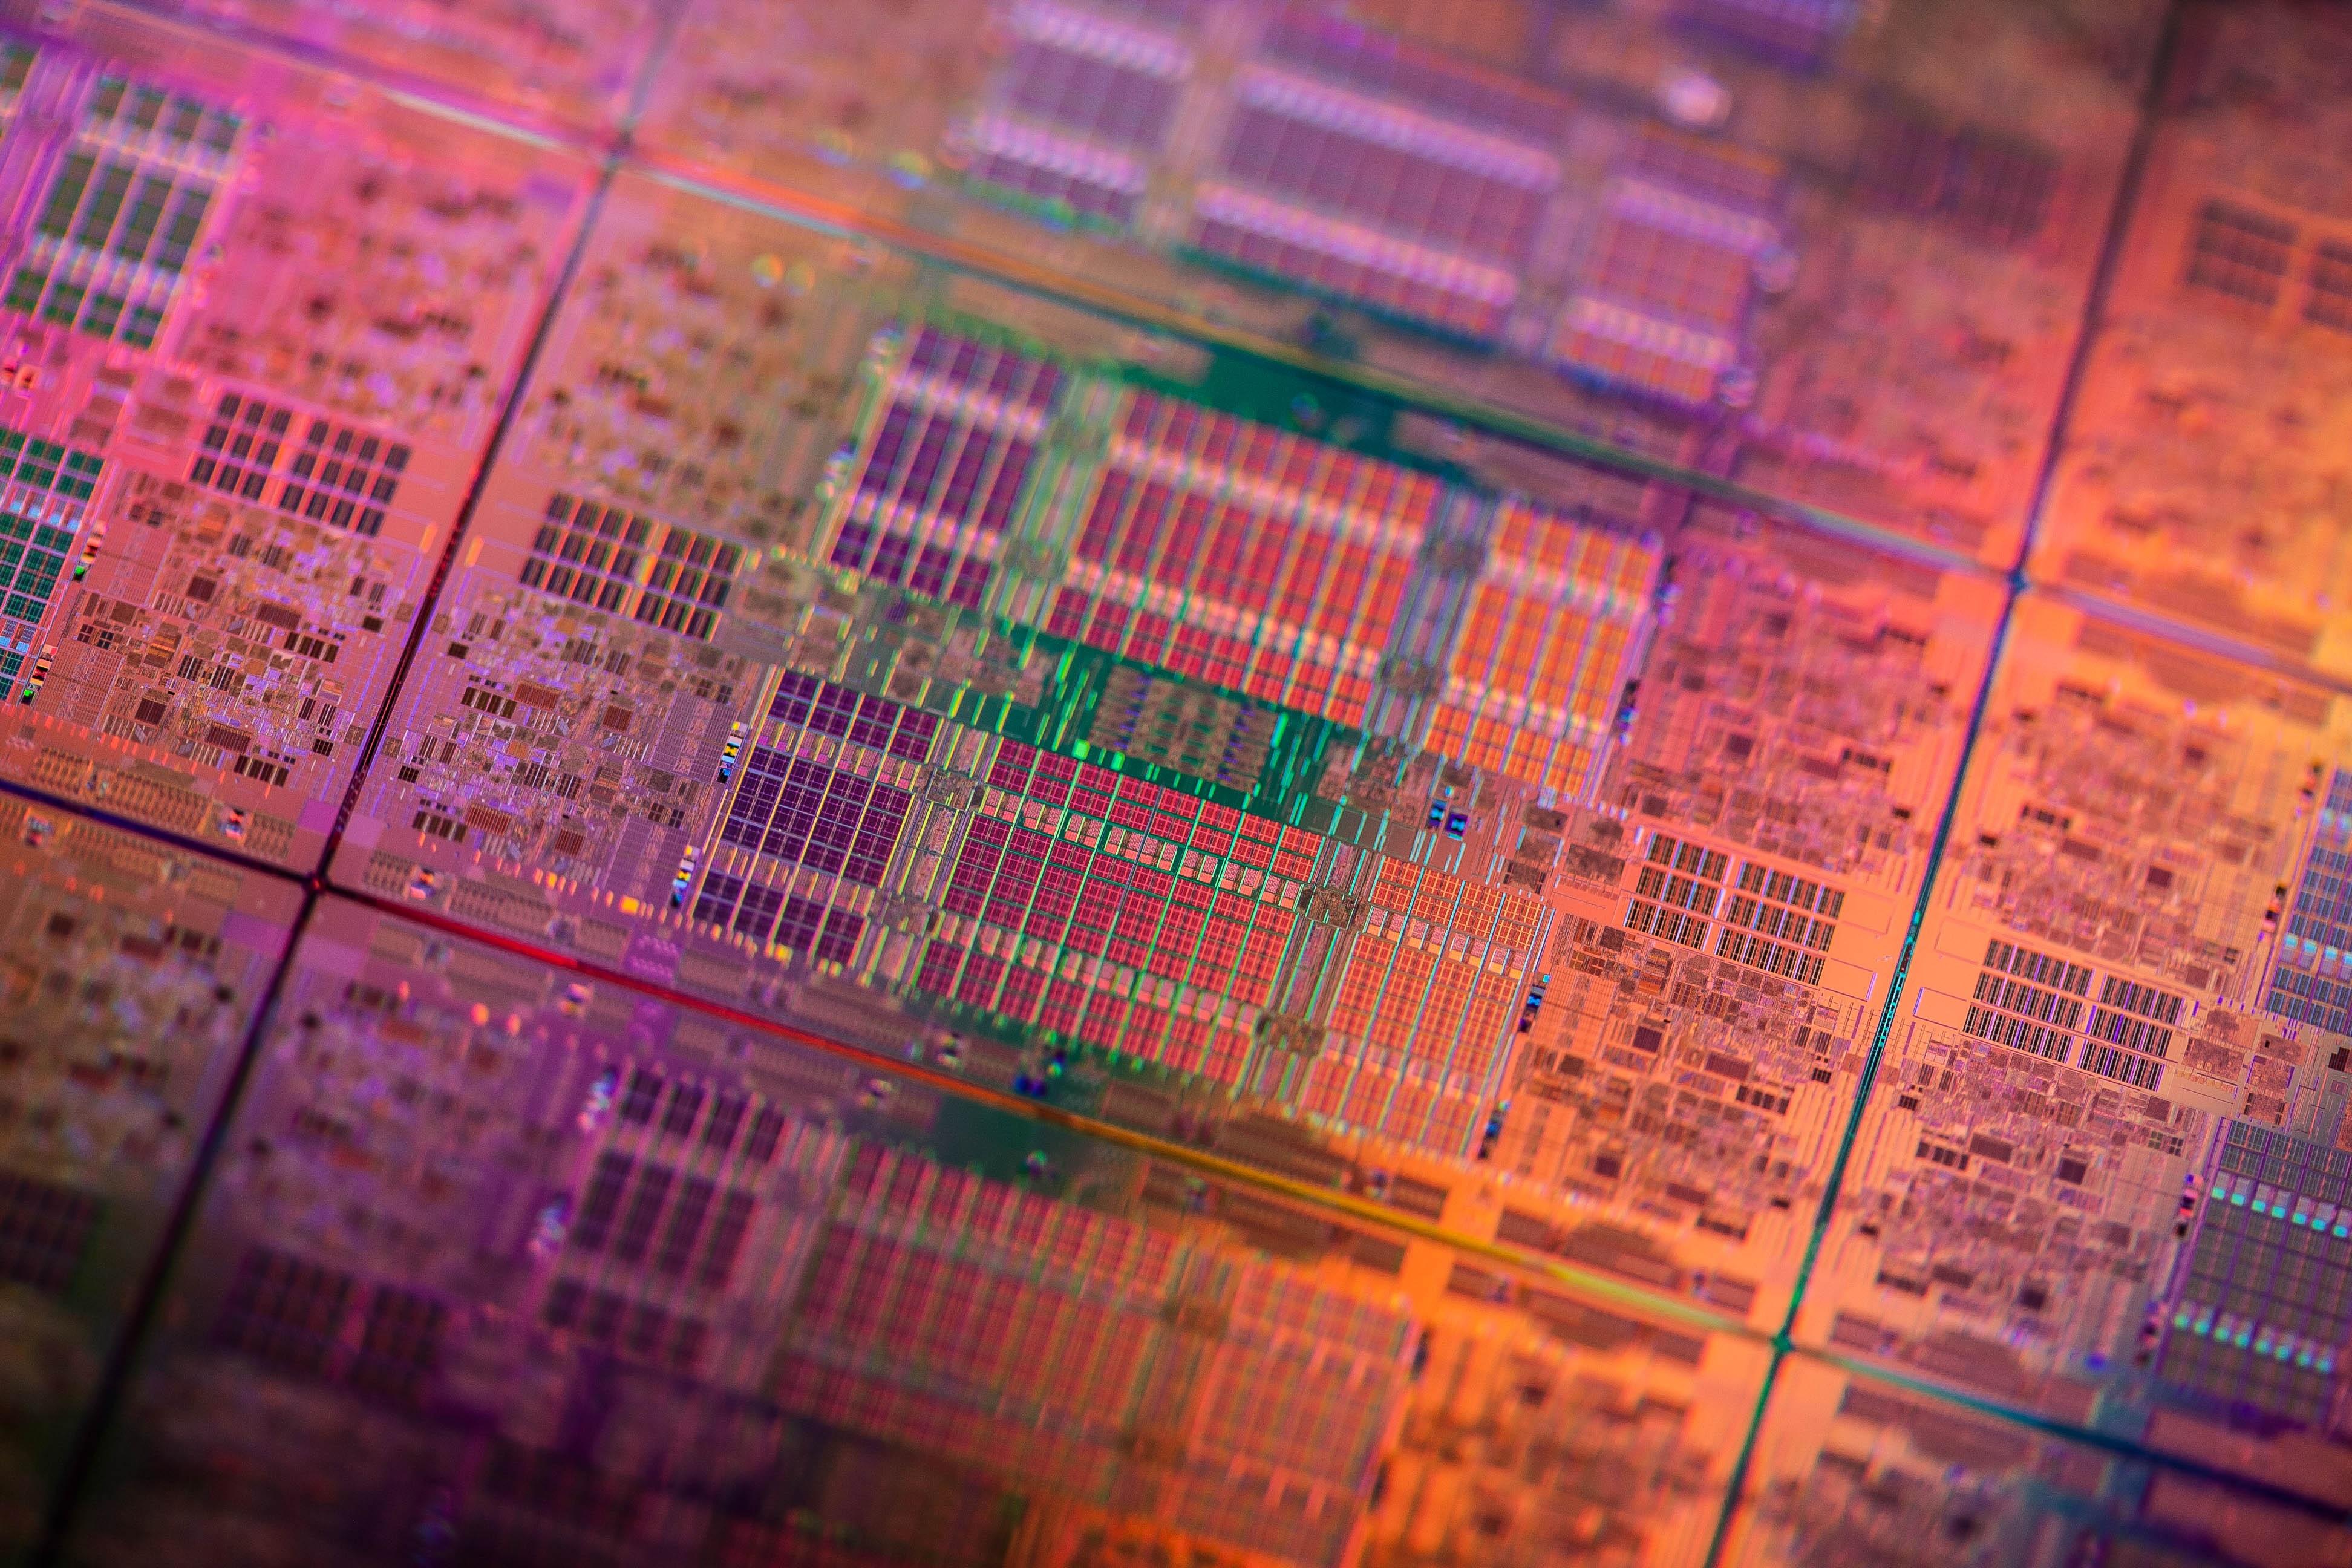 A wafer of Intel Itanium processors.